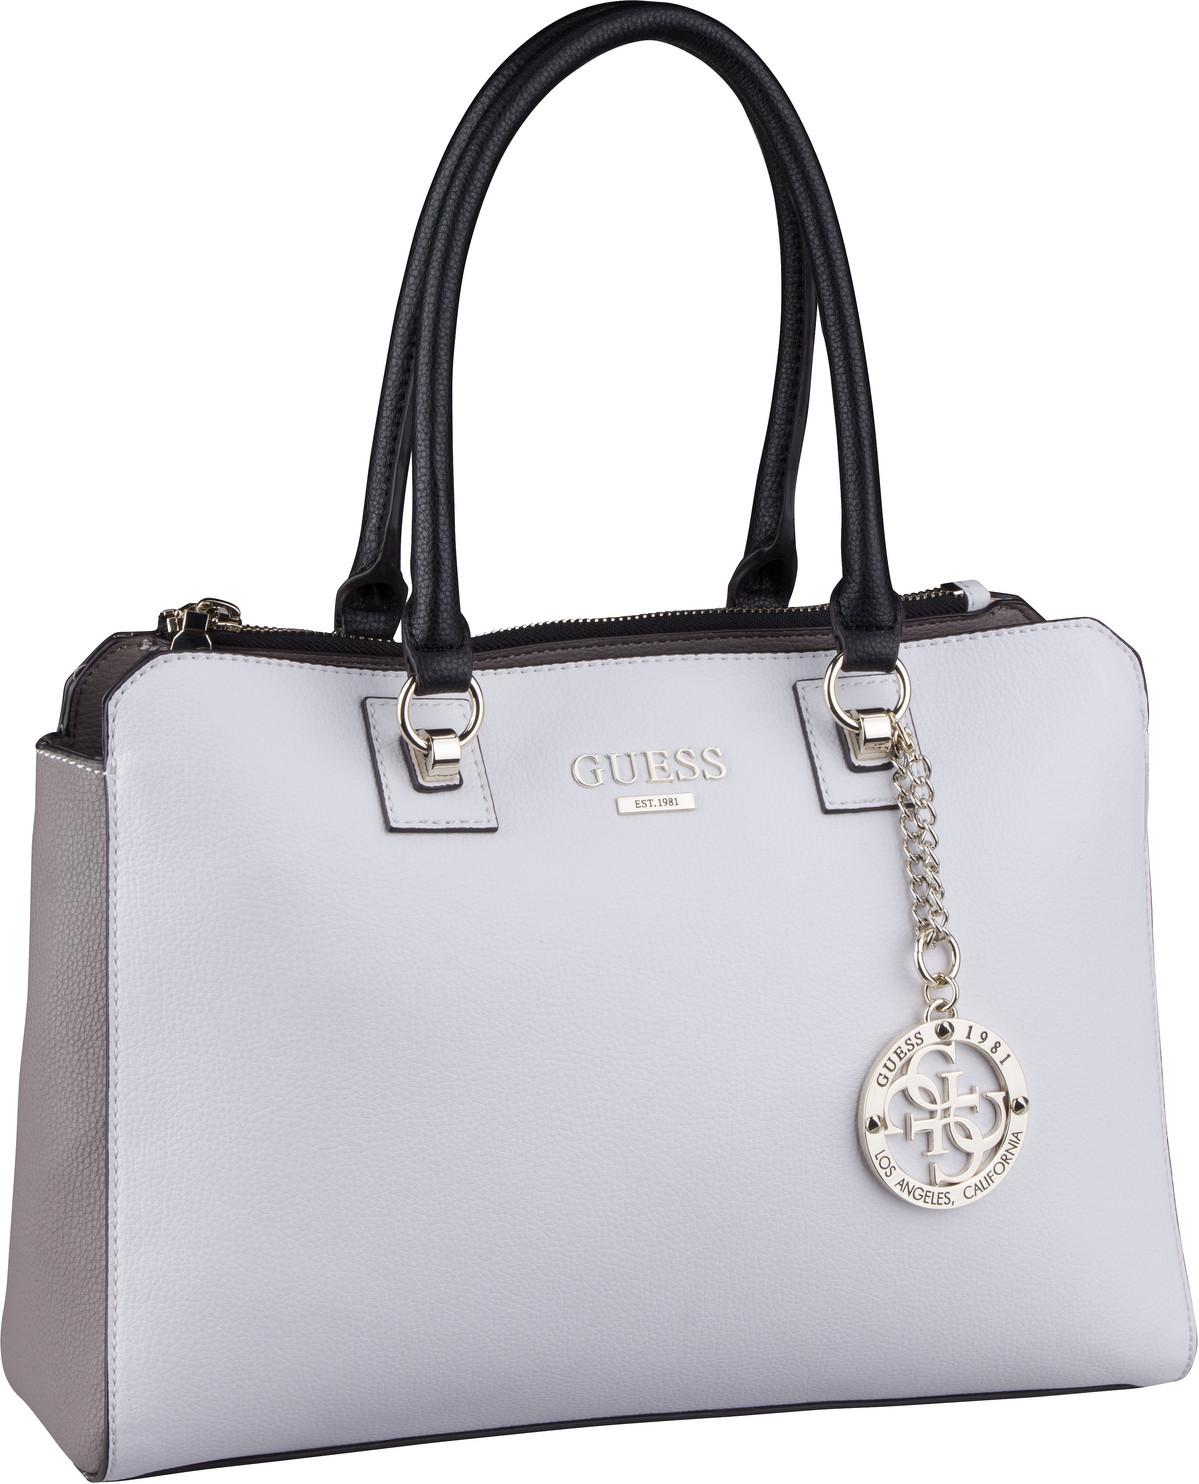 Handtasche Alma Society Satchel White Multi